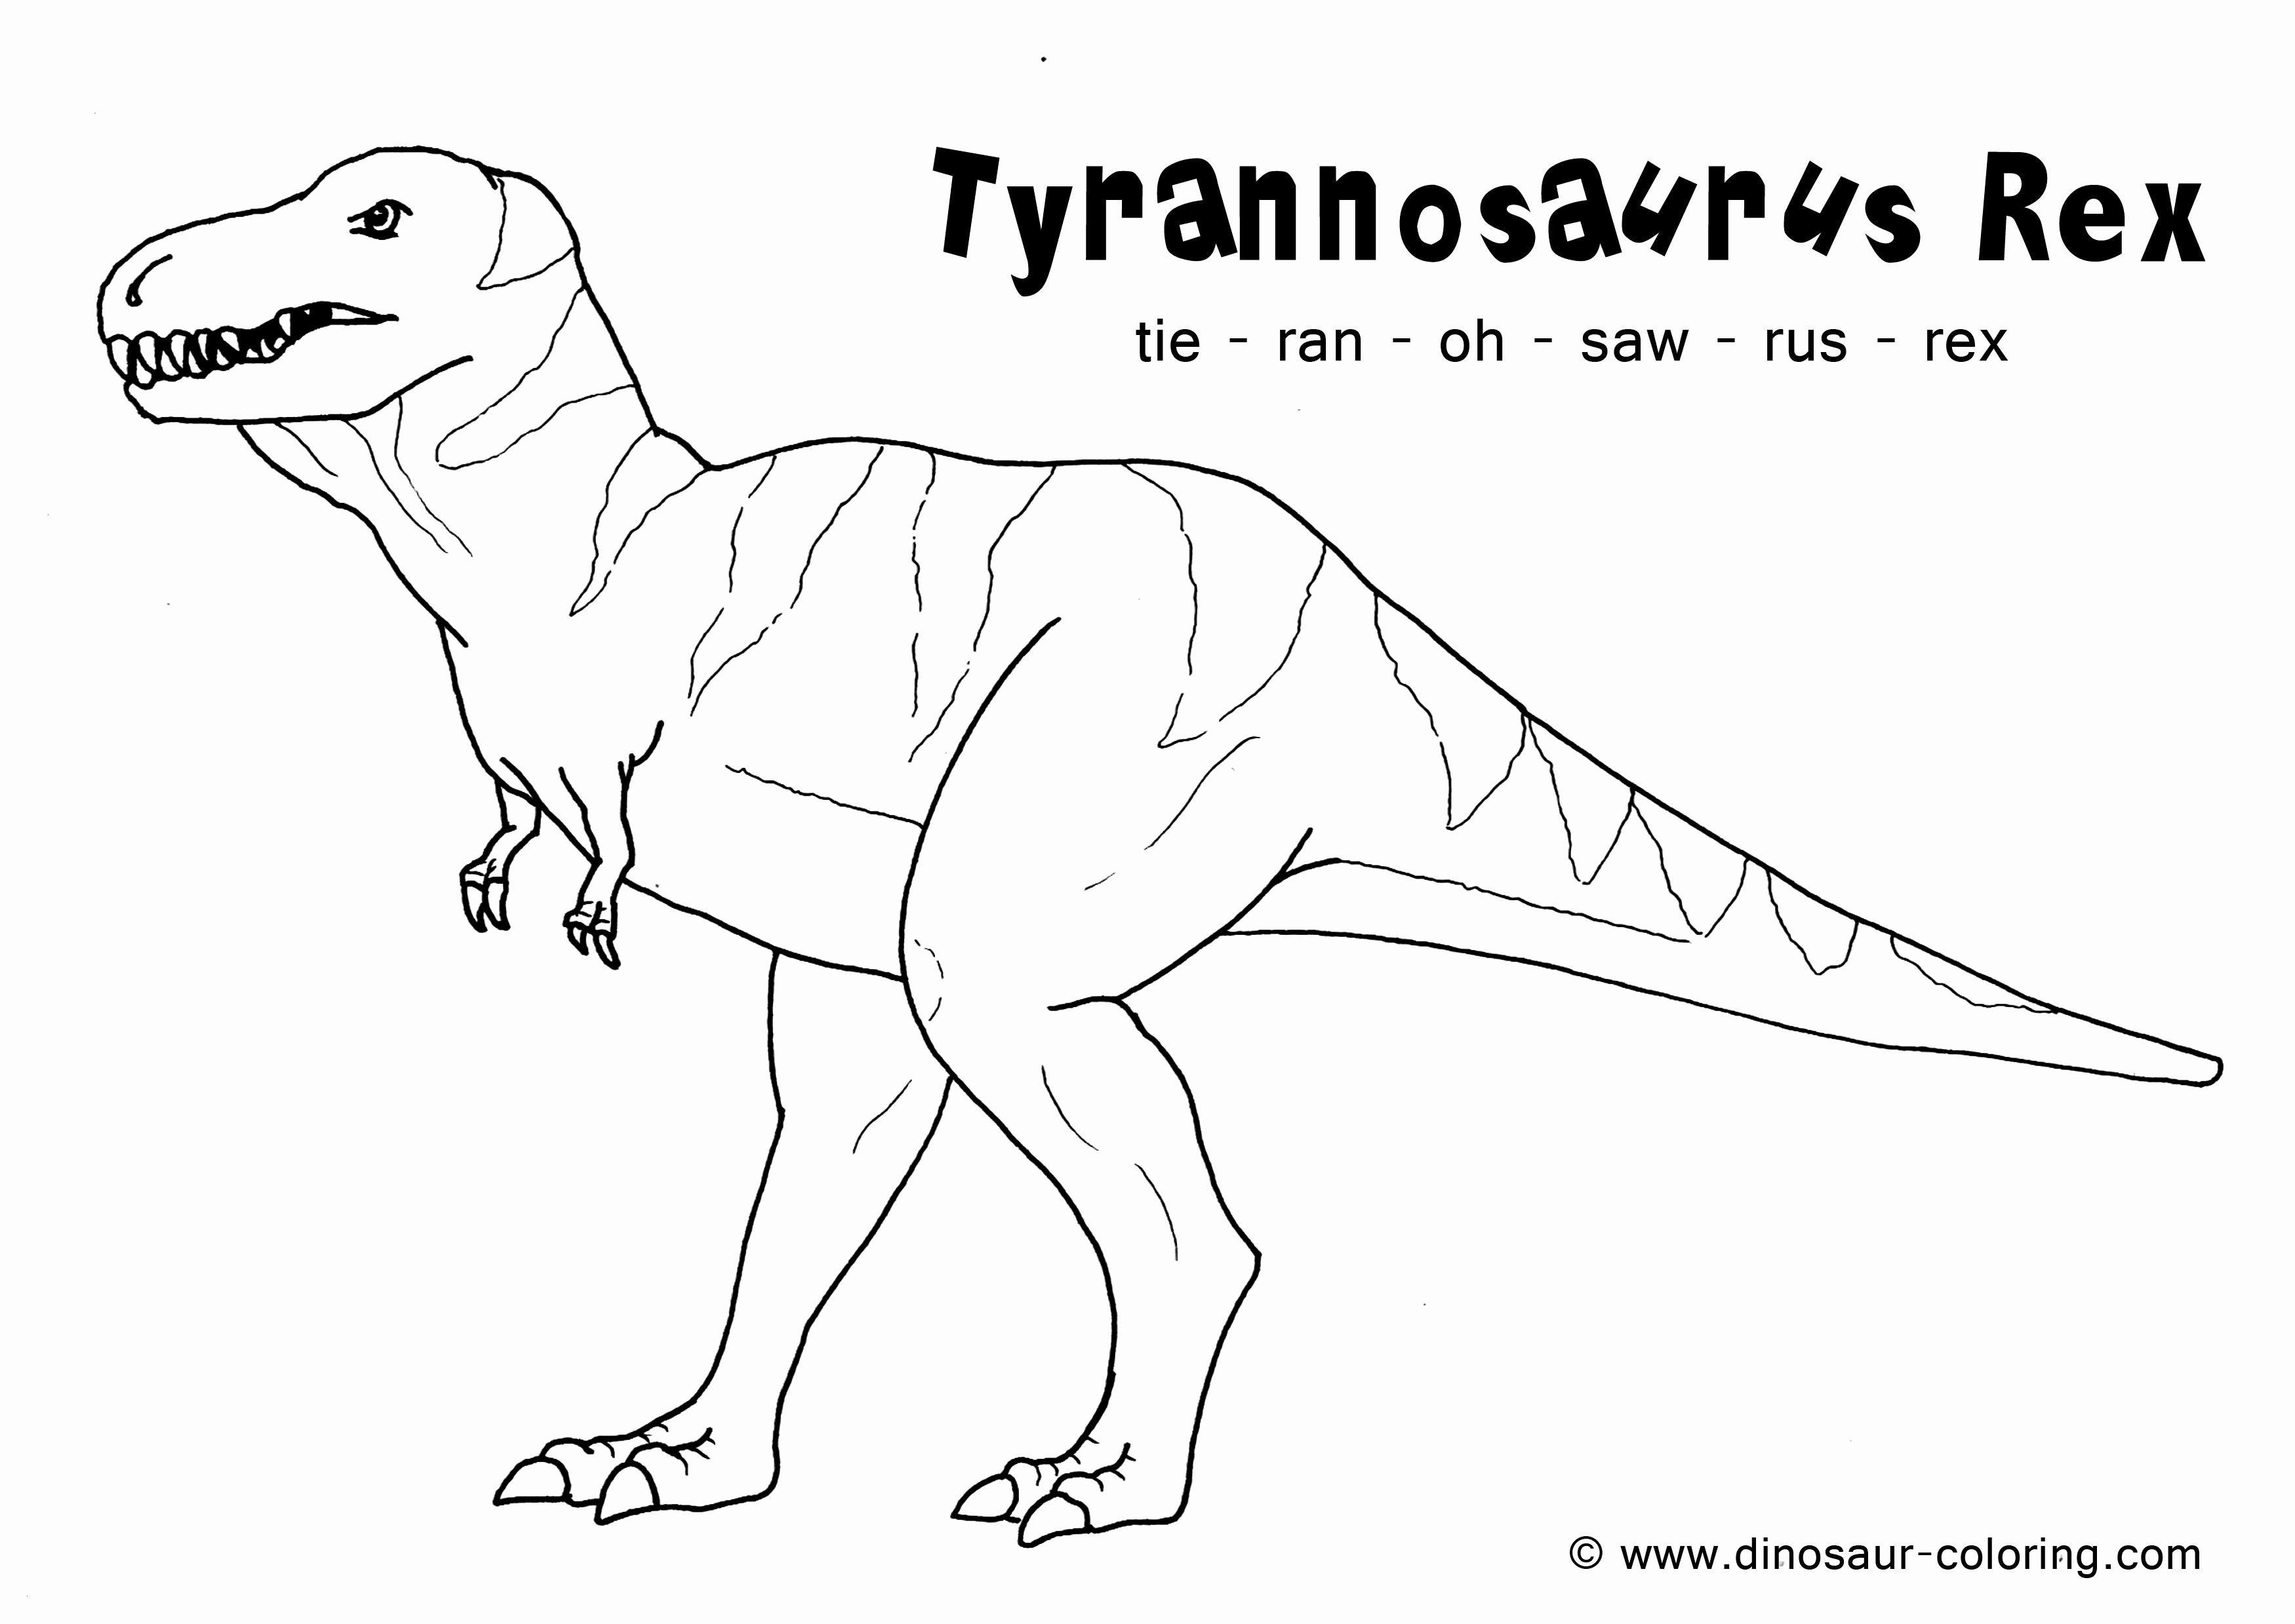 Dinosaurier Ausmalbilder Tyrannosaurus Rex Frisch Malvorlagen Dinosaurier Best 35 Ausmalbilder Dino Zug Stock